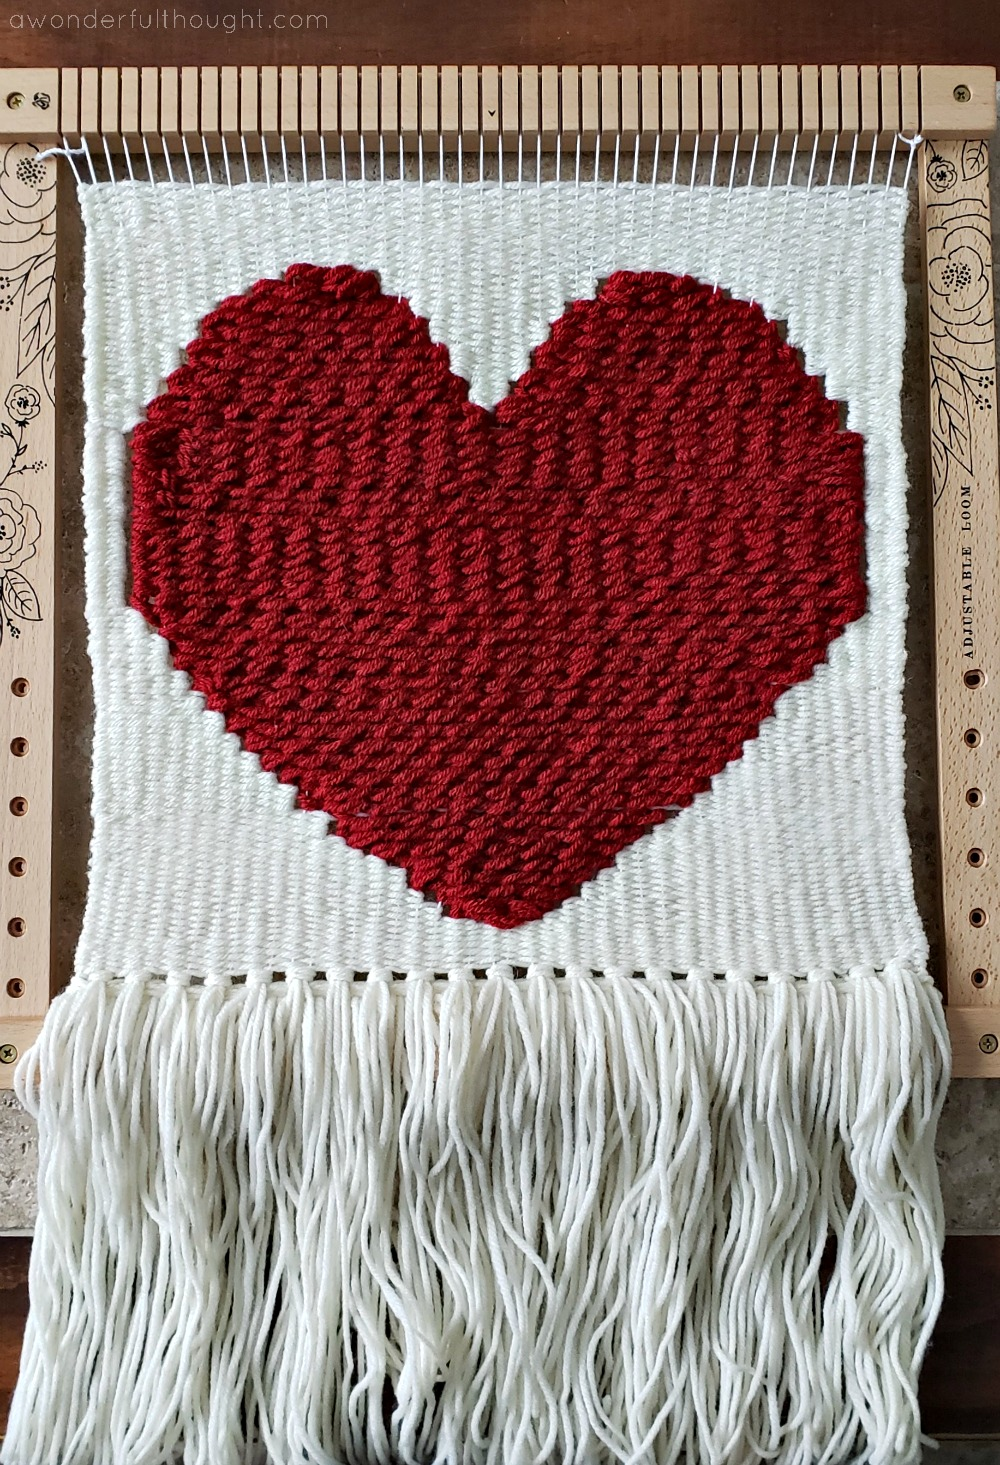 nursery home decor baby shower gift wool roving woven wall hanging heart fiber art valentine wall hanging weaving Heart wall hanging